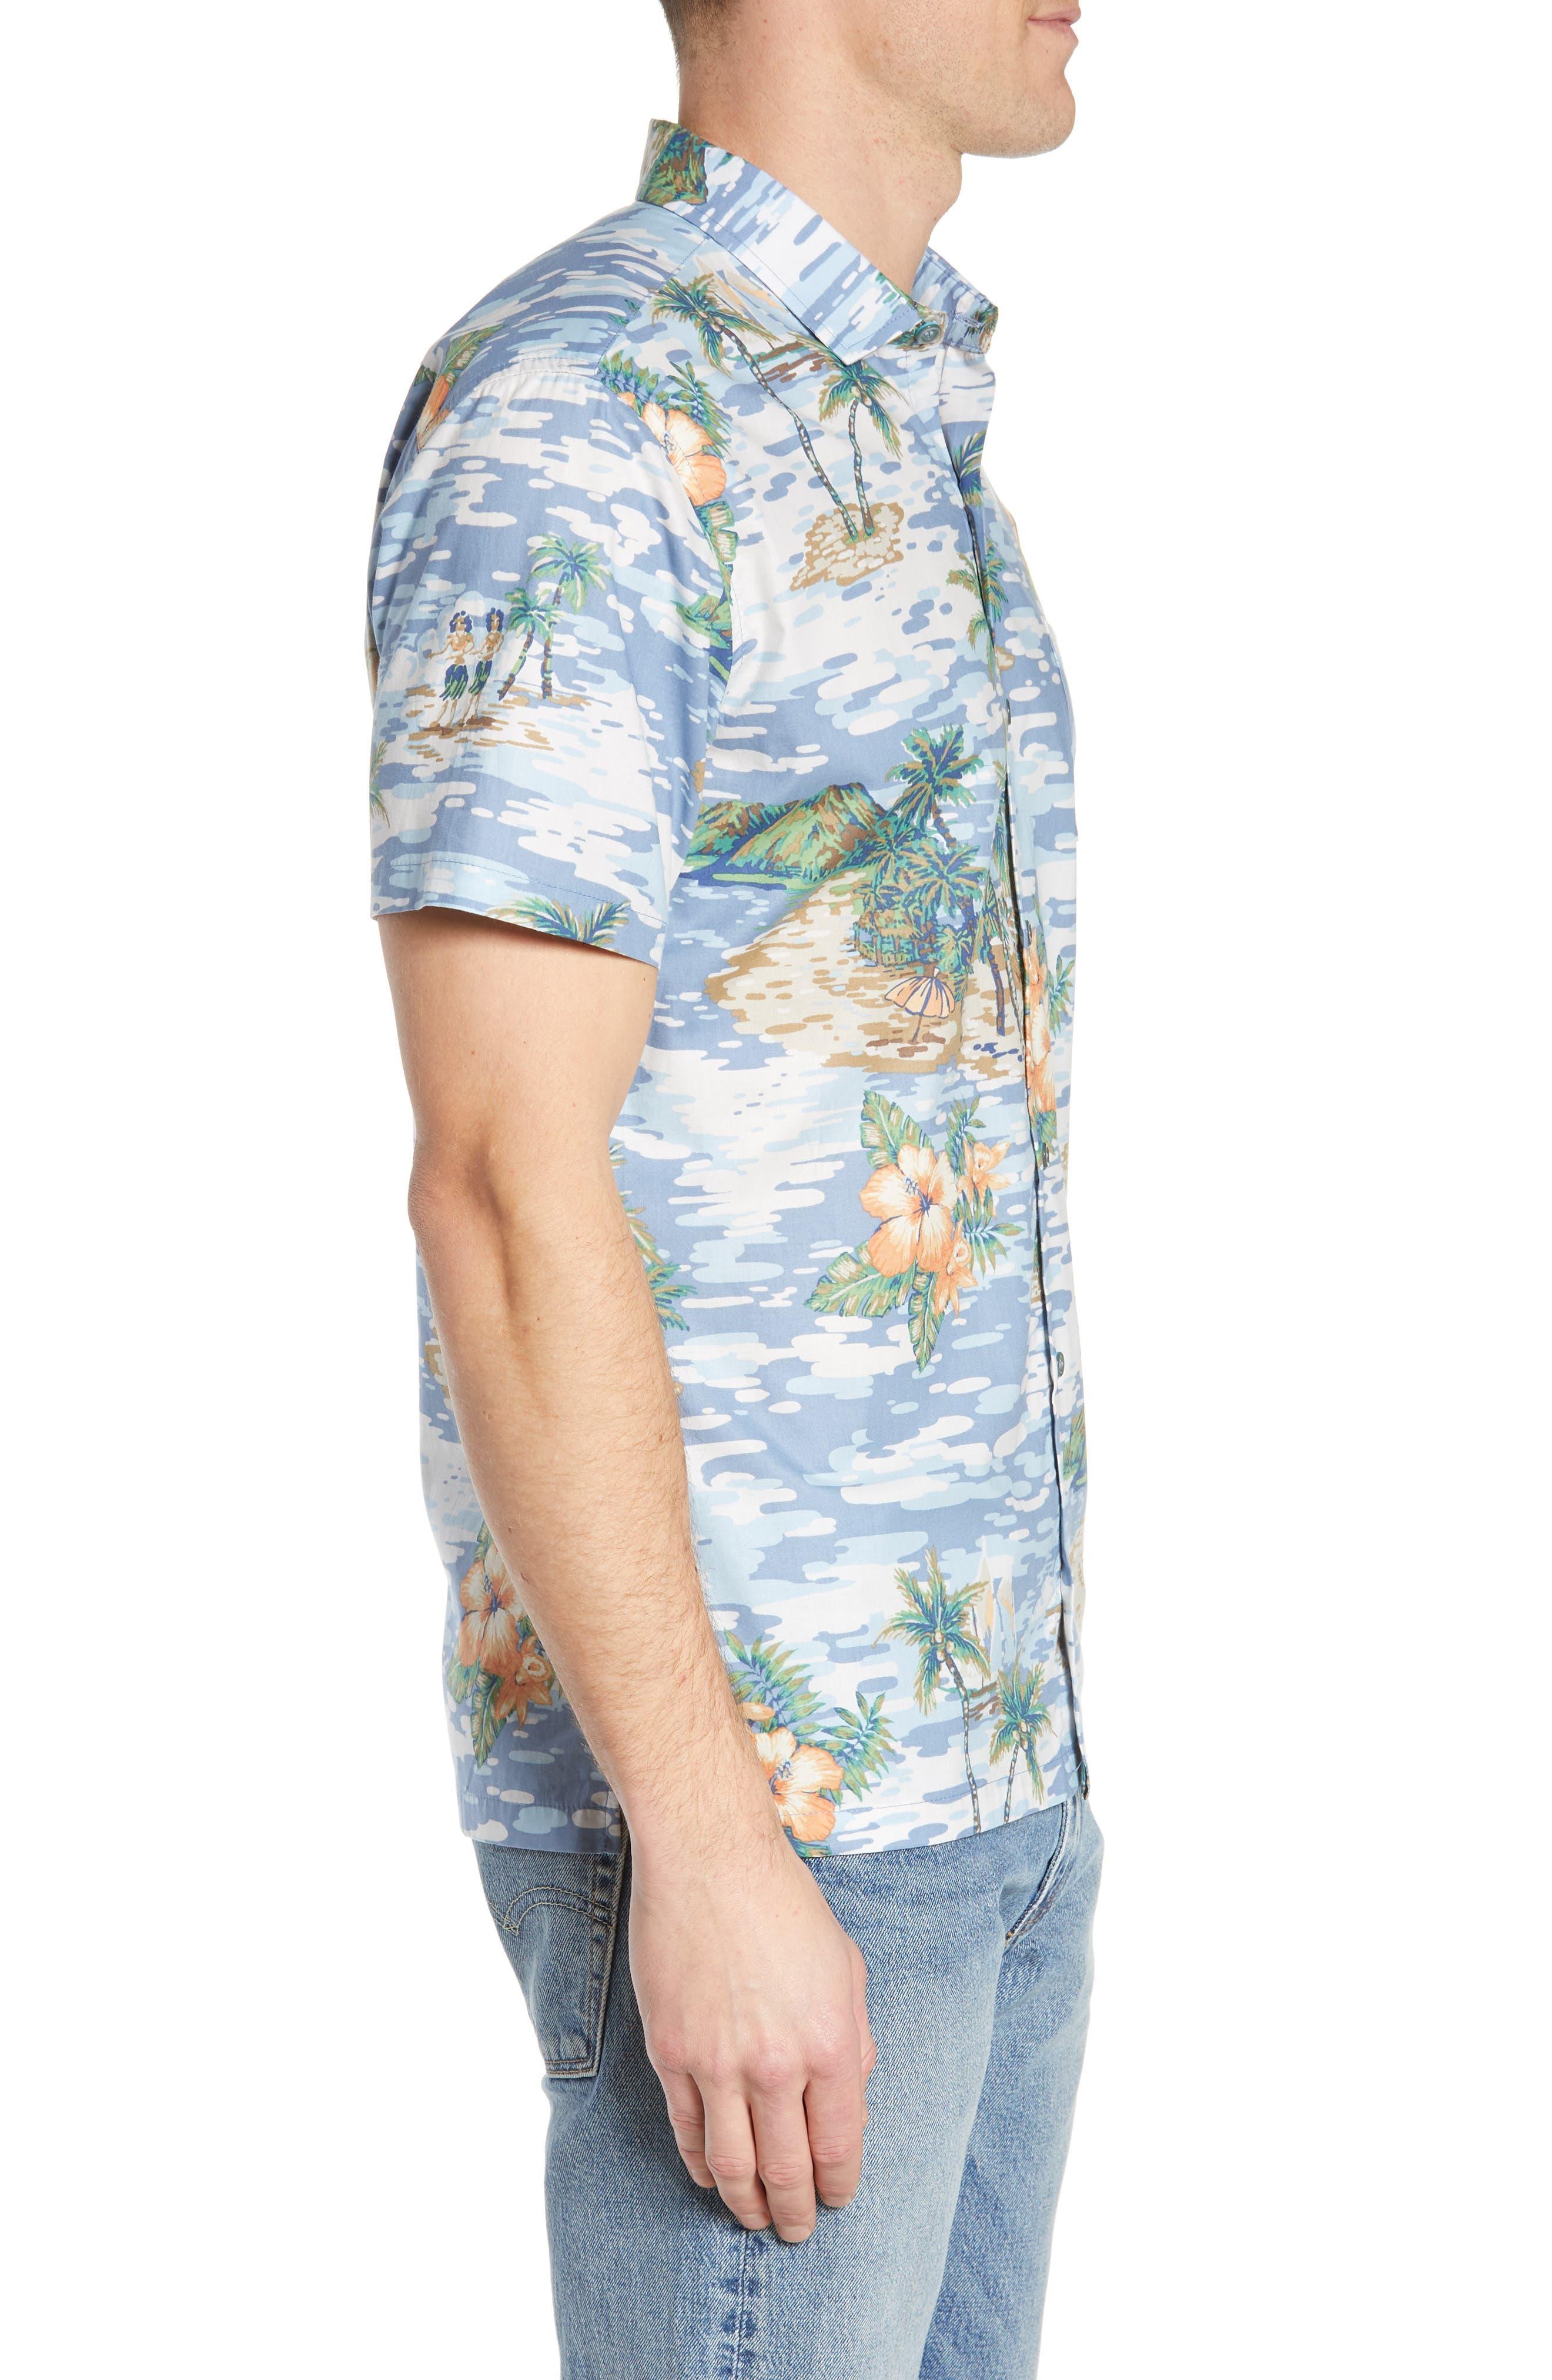 TORI RICHARD, Archipelago Regular Fit Sport Shirt, Alternate thumbnail 4, color, 061